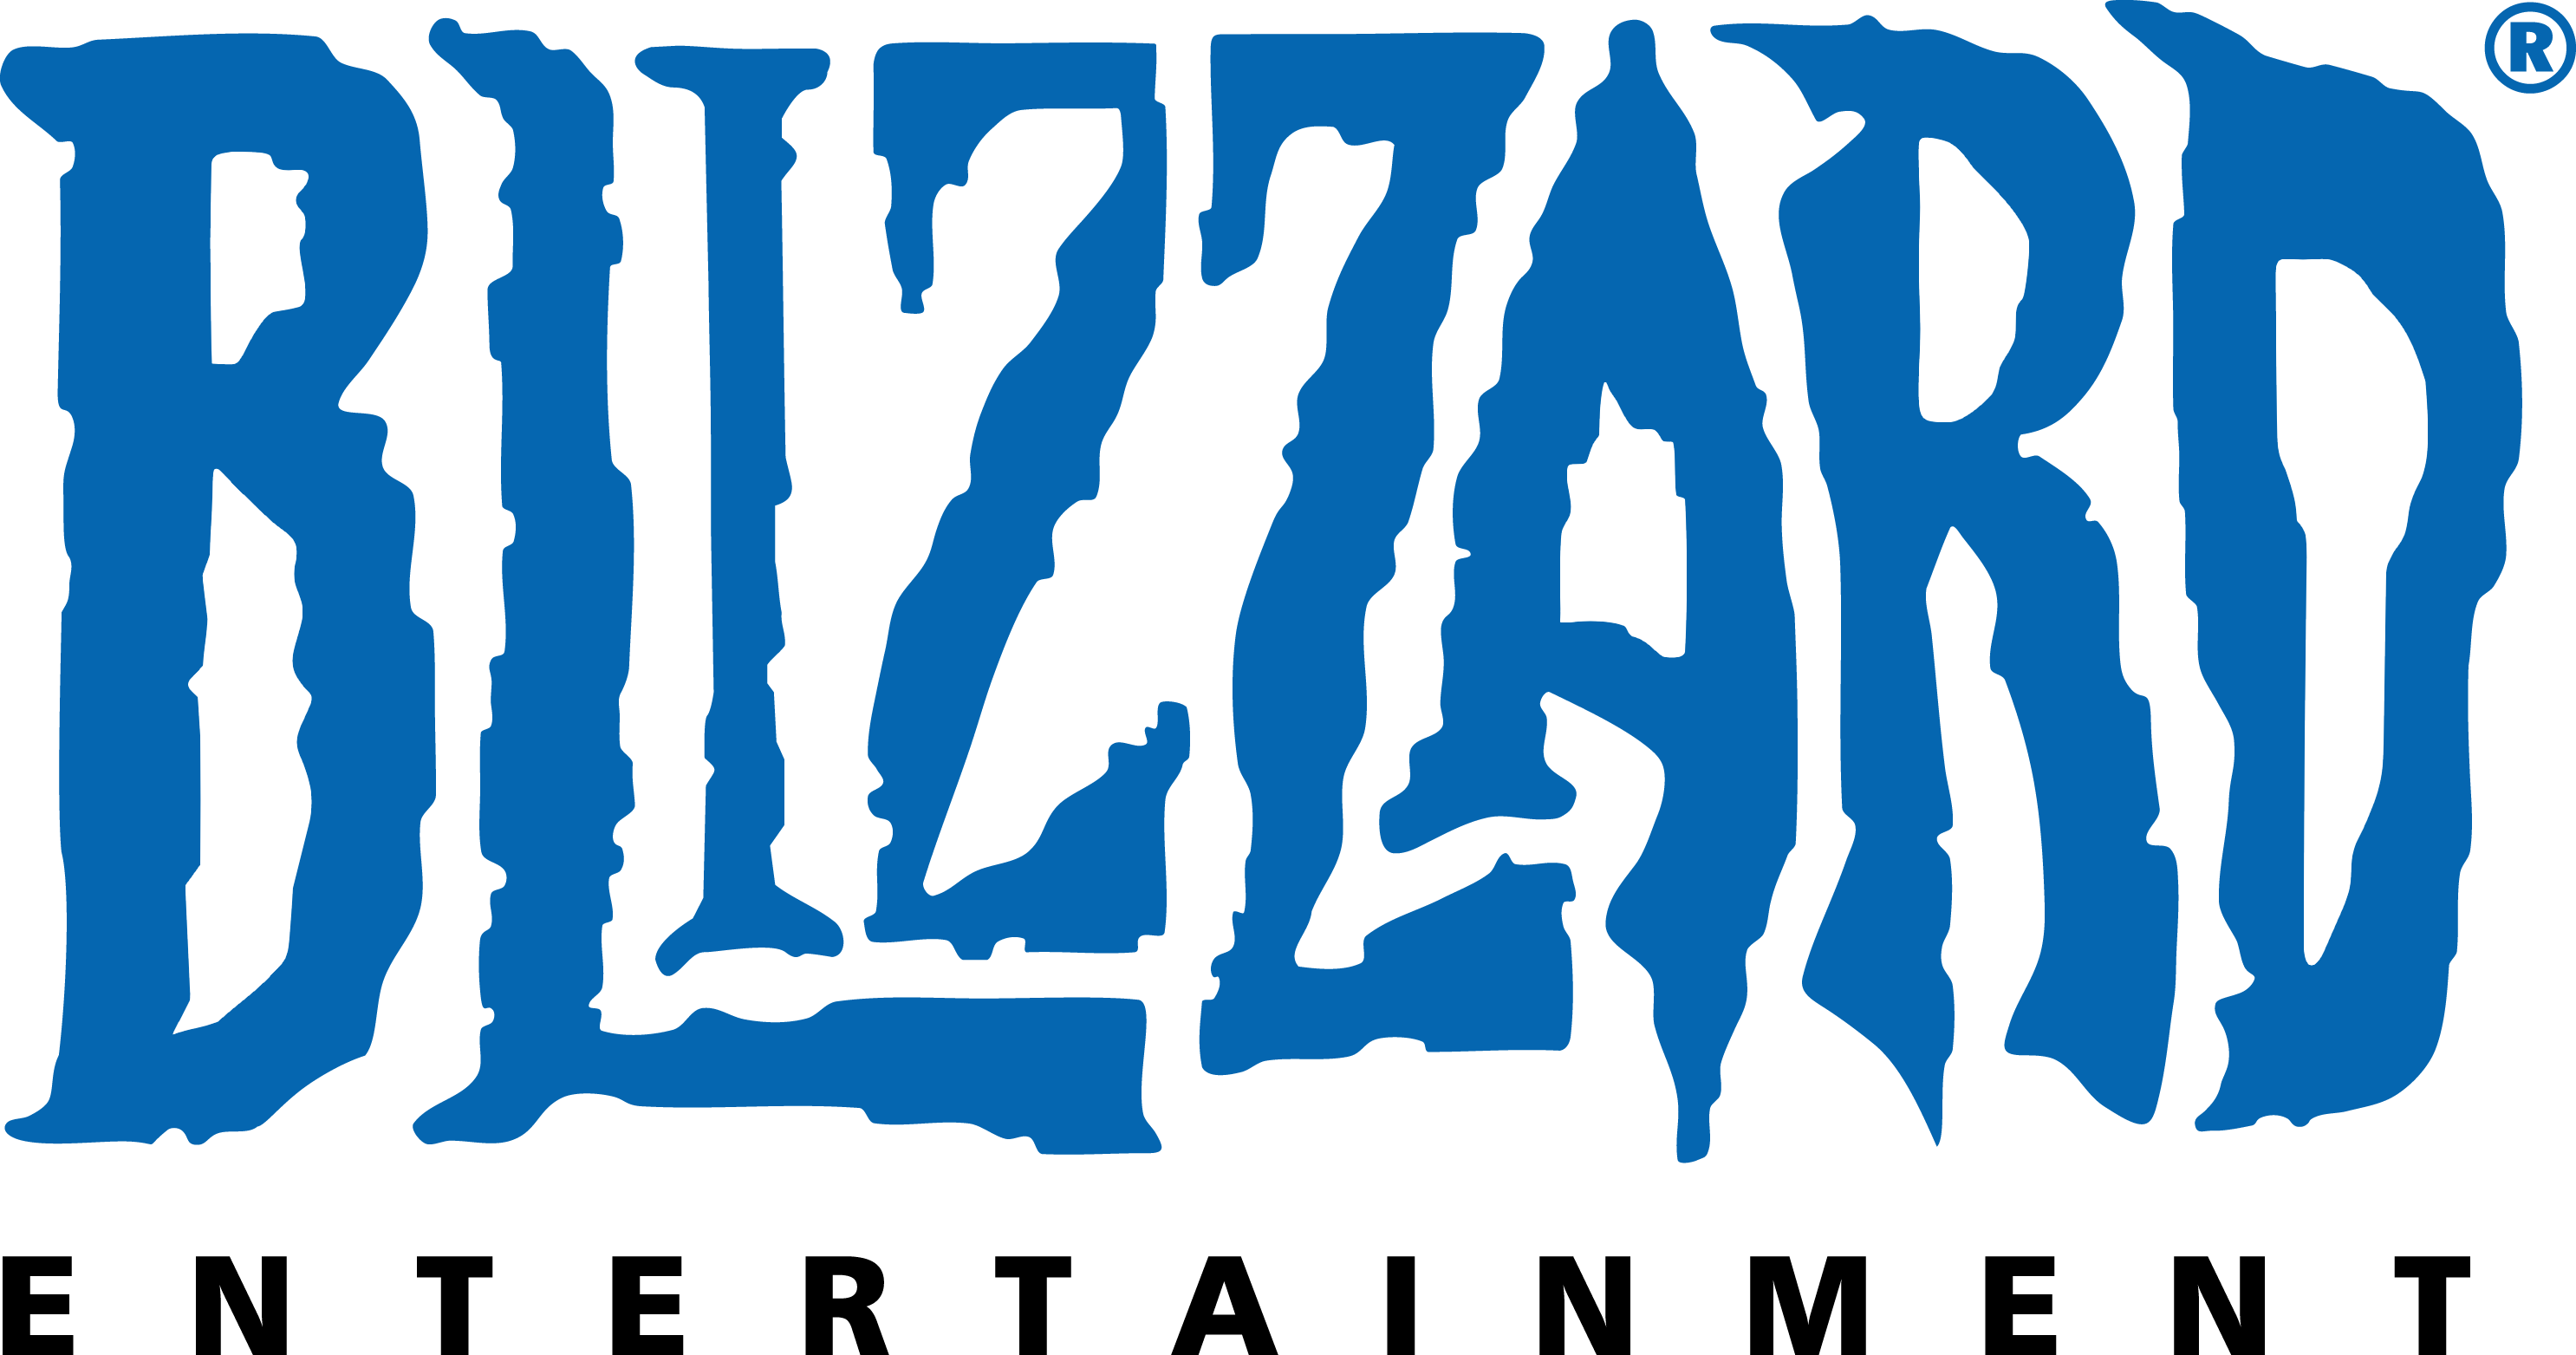 Blizzard Logo Png Free Downloads Blizzard Entertainment Entertainment Logo Starcraft